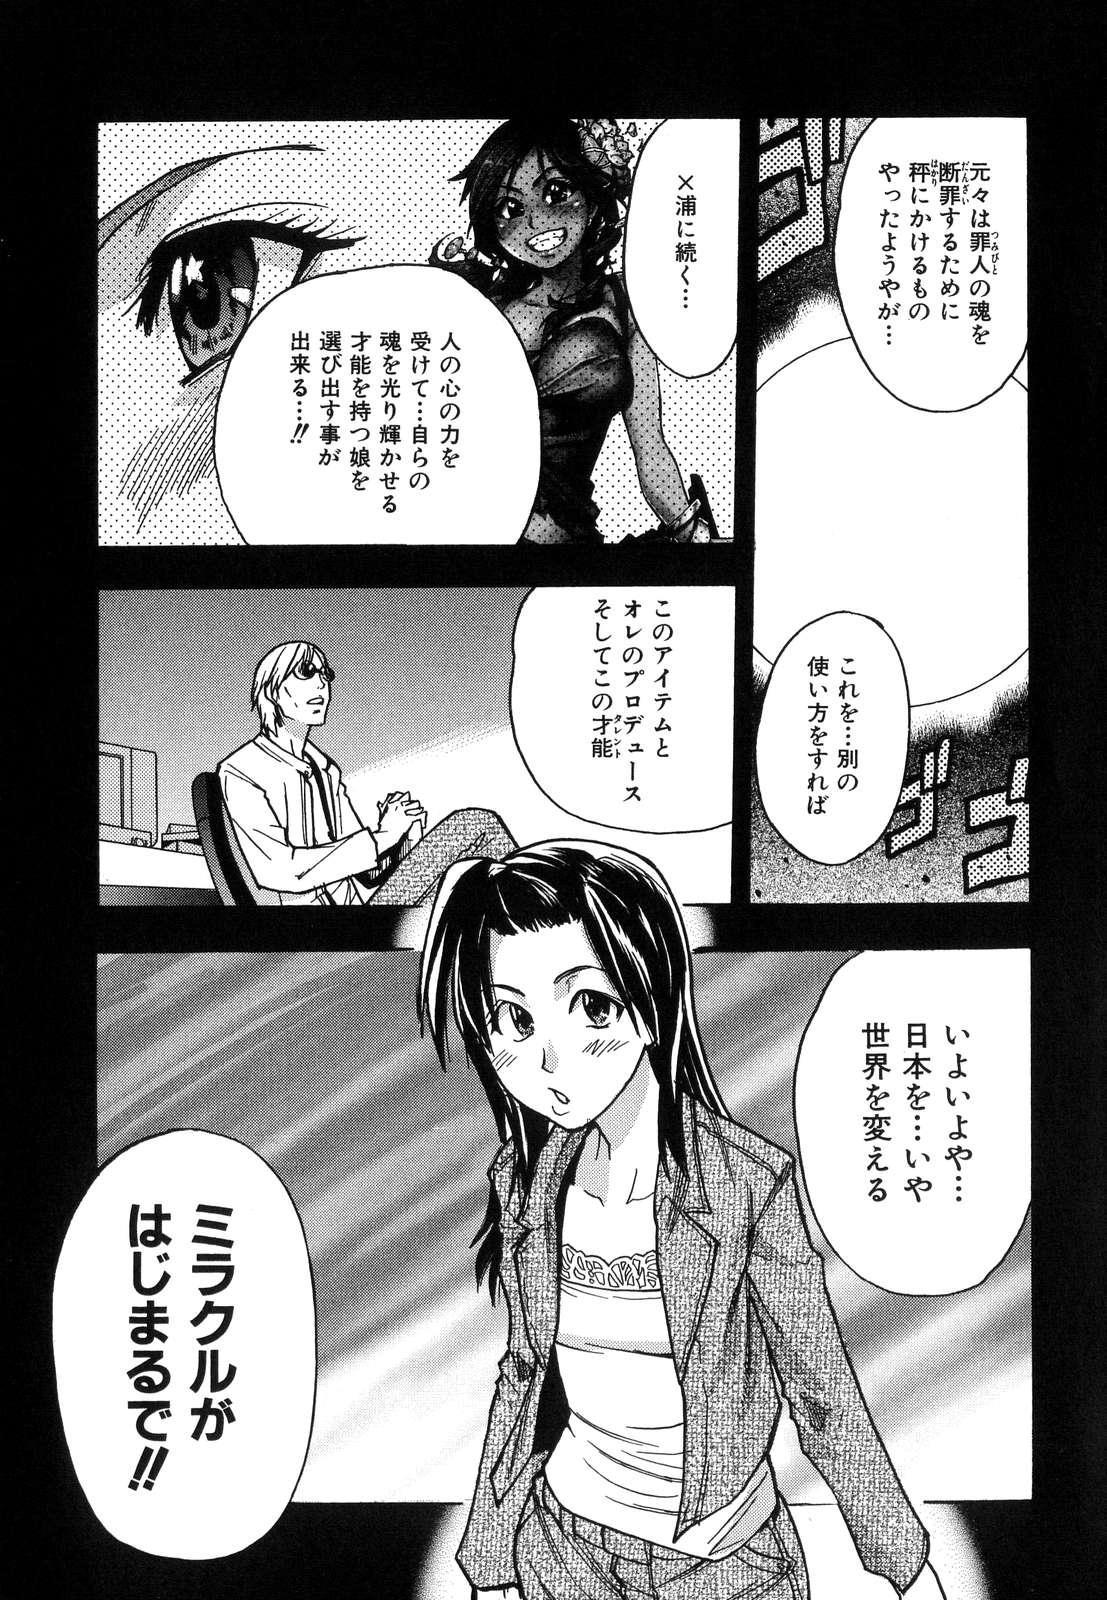 Shining Musume. 6. Rainbow Six 219